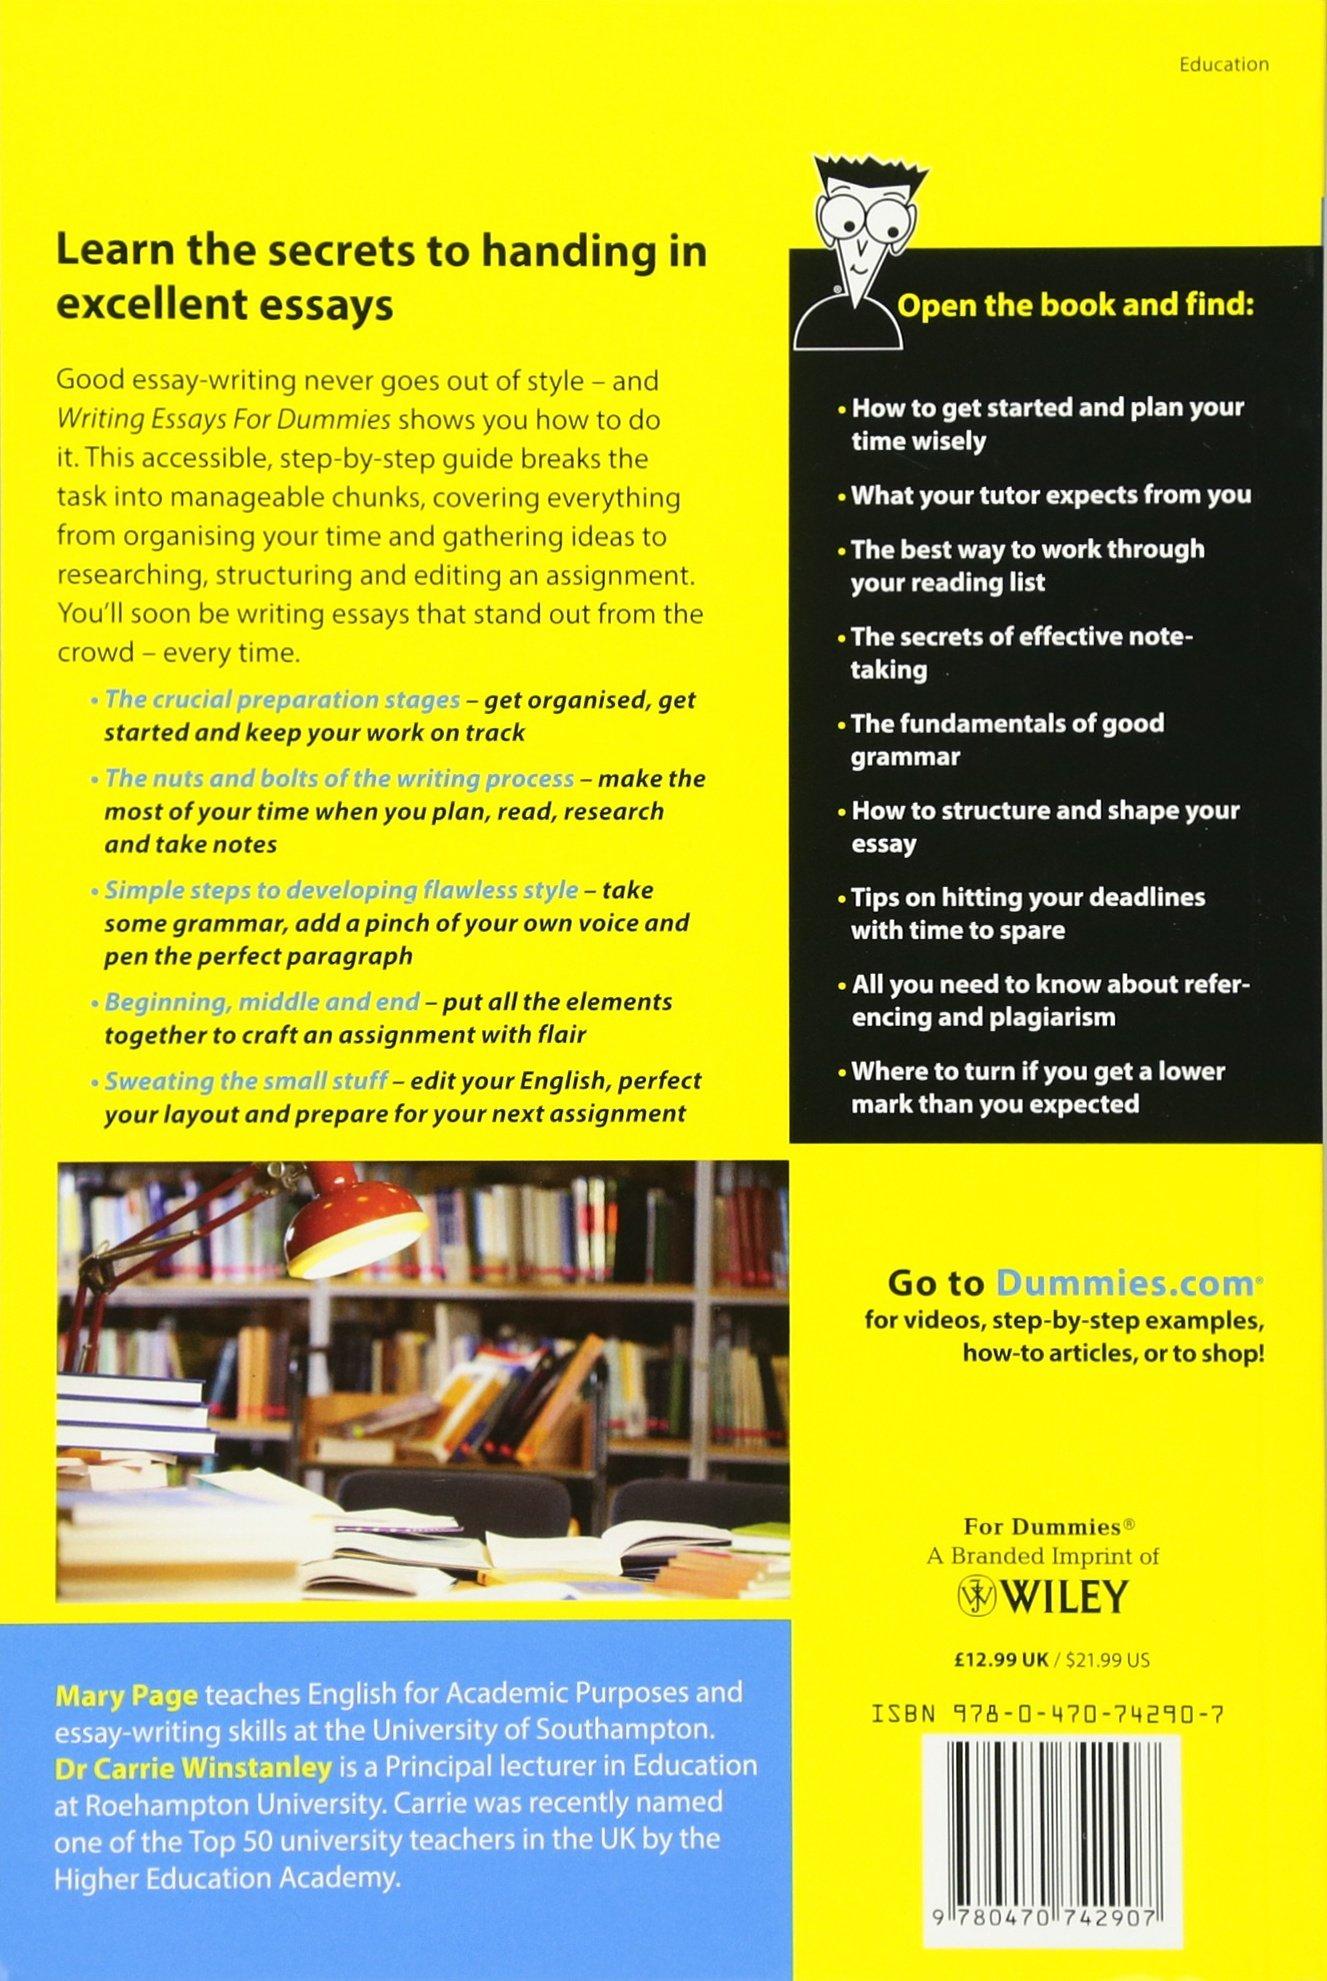 001 81ezsvpvmal Writing Essays For Dummies Essay Wondrous Pdf Free Download Cheat Sheet Full